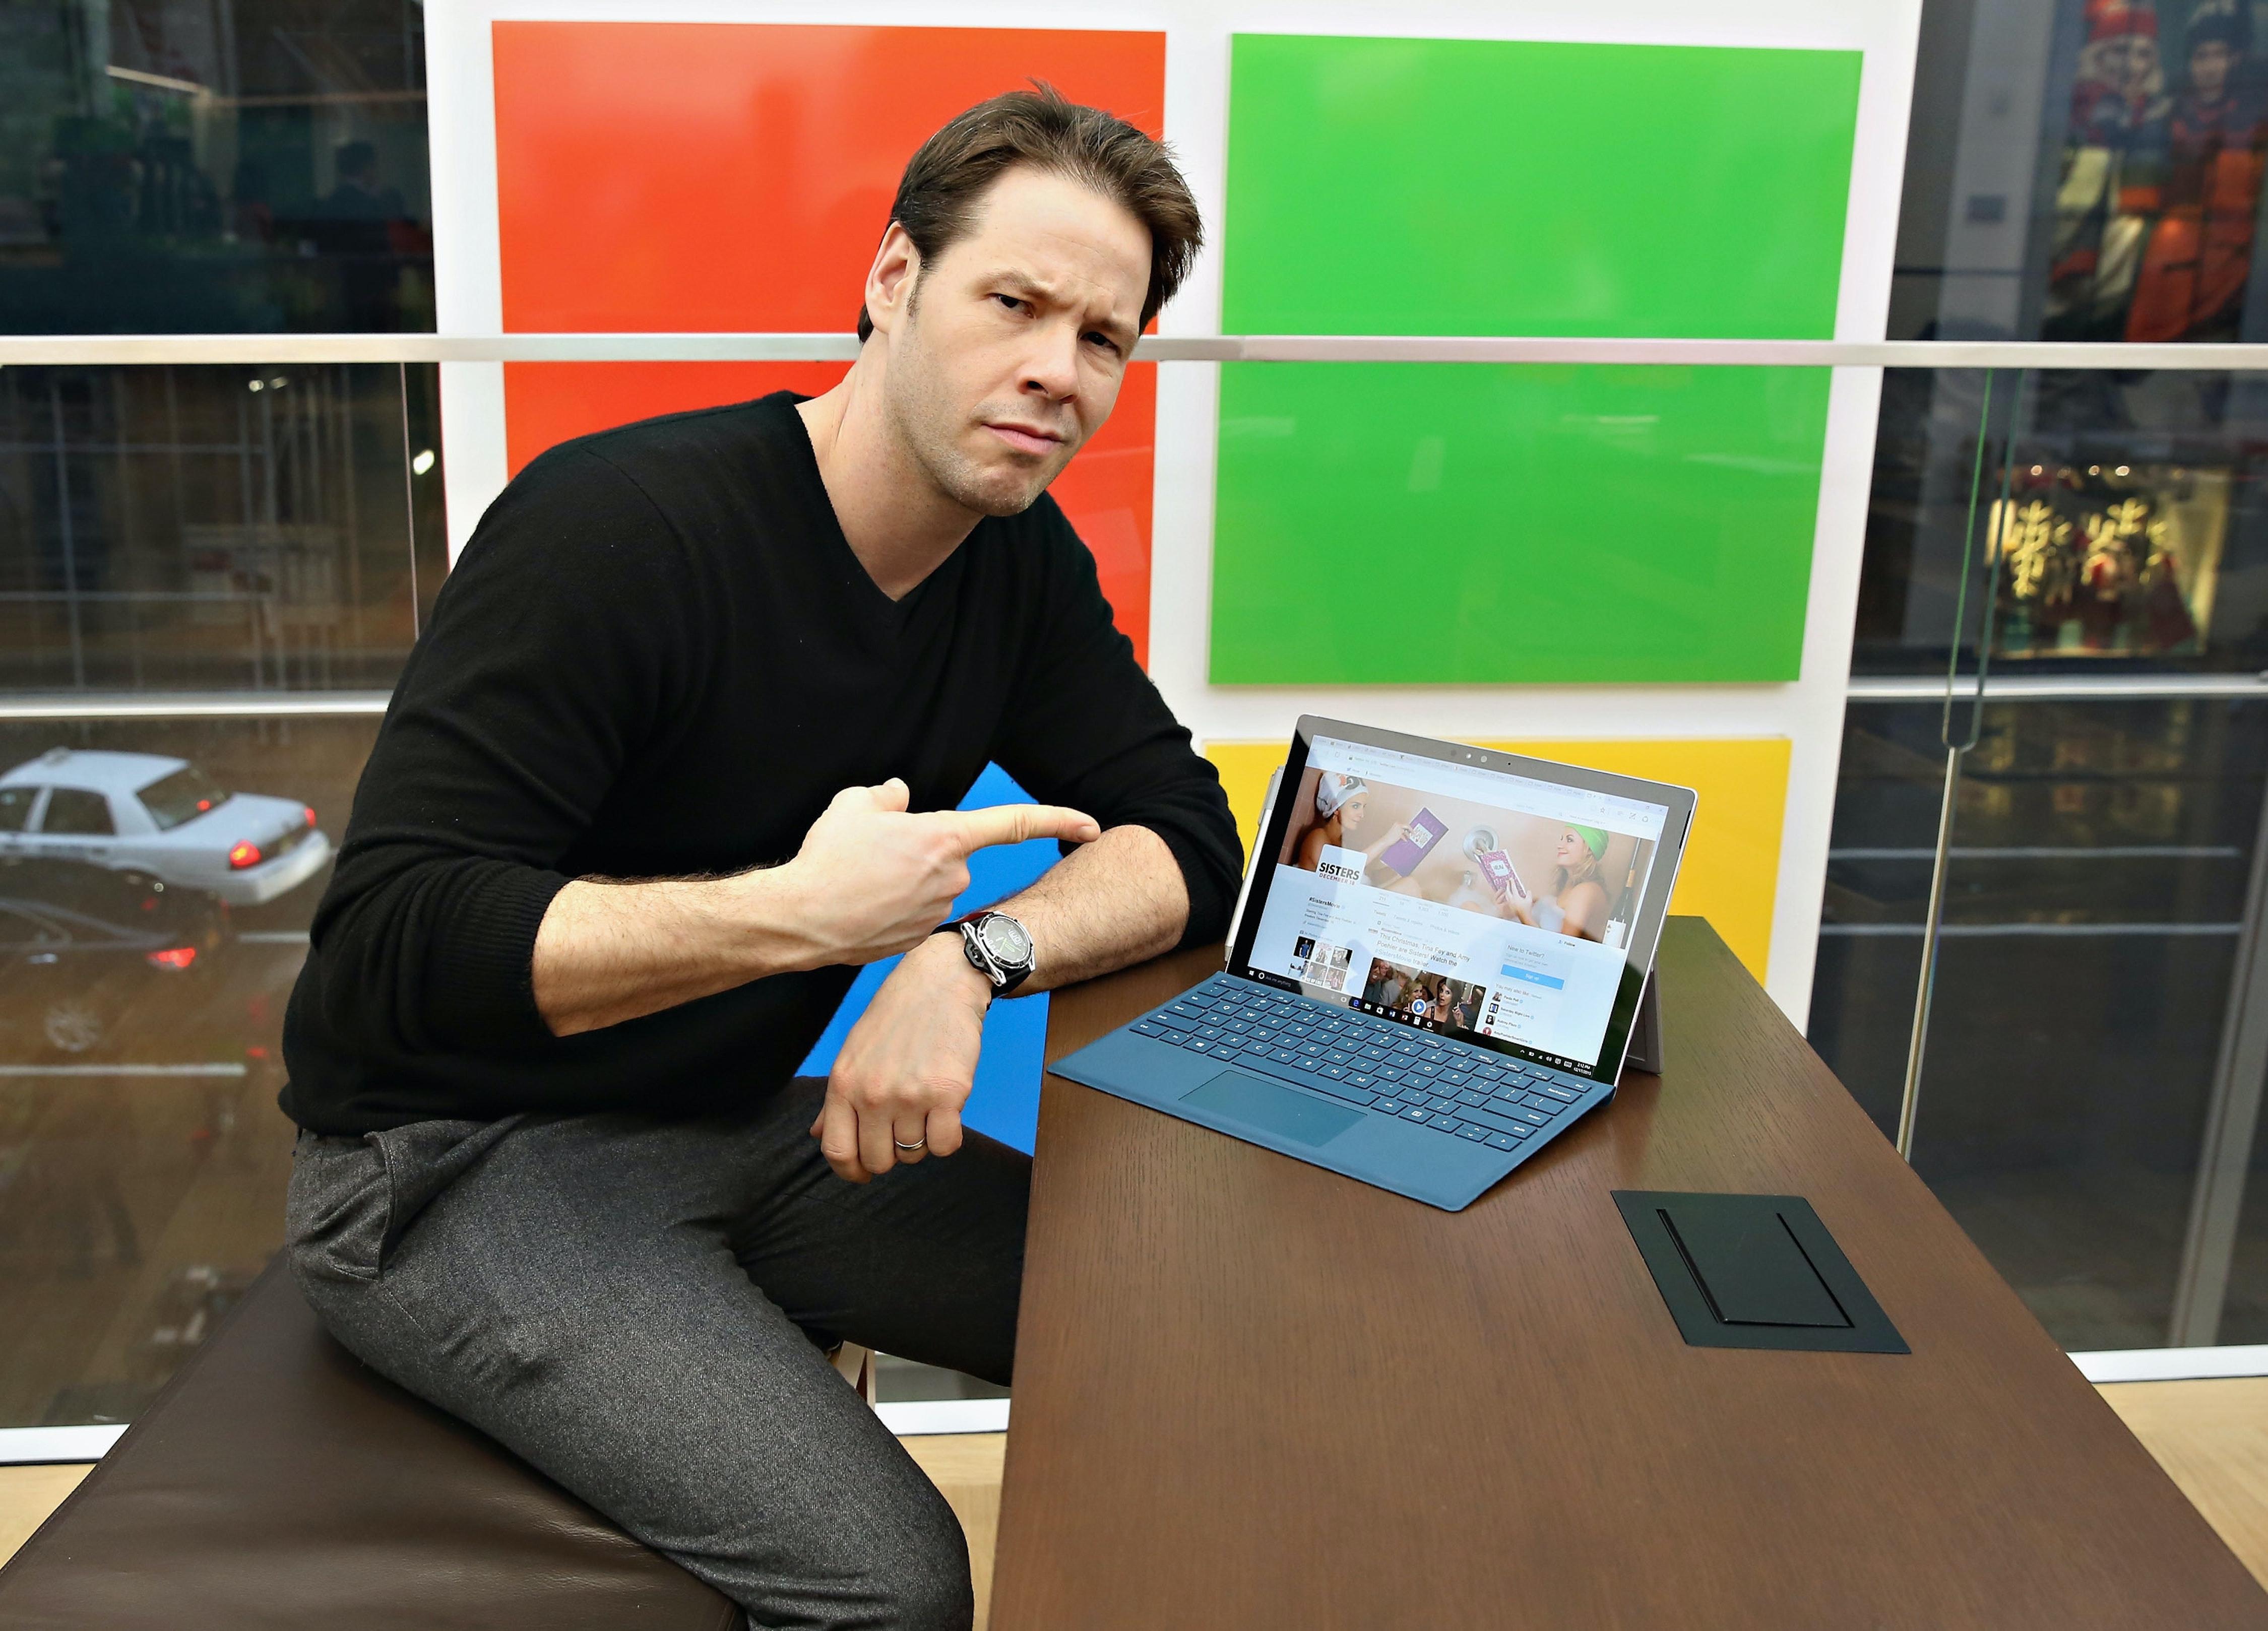 Comedian Ike Barinholtz uses Windows 10.